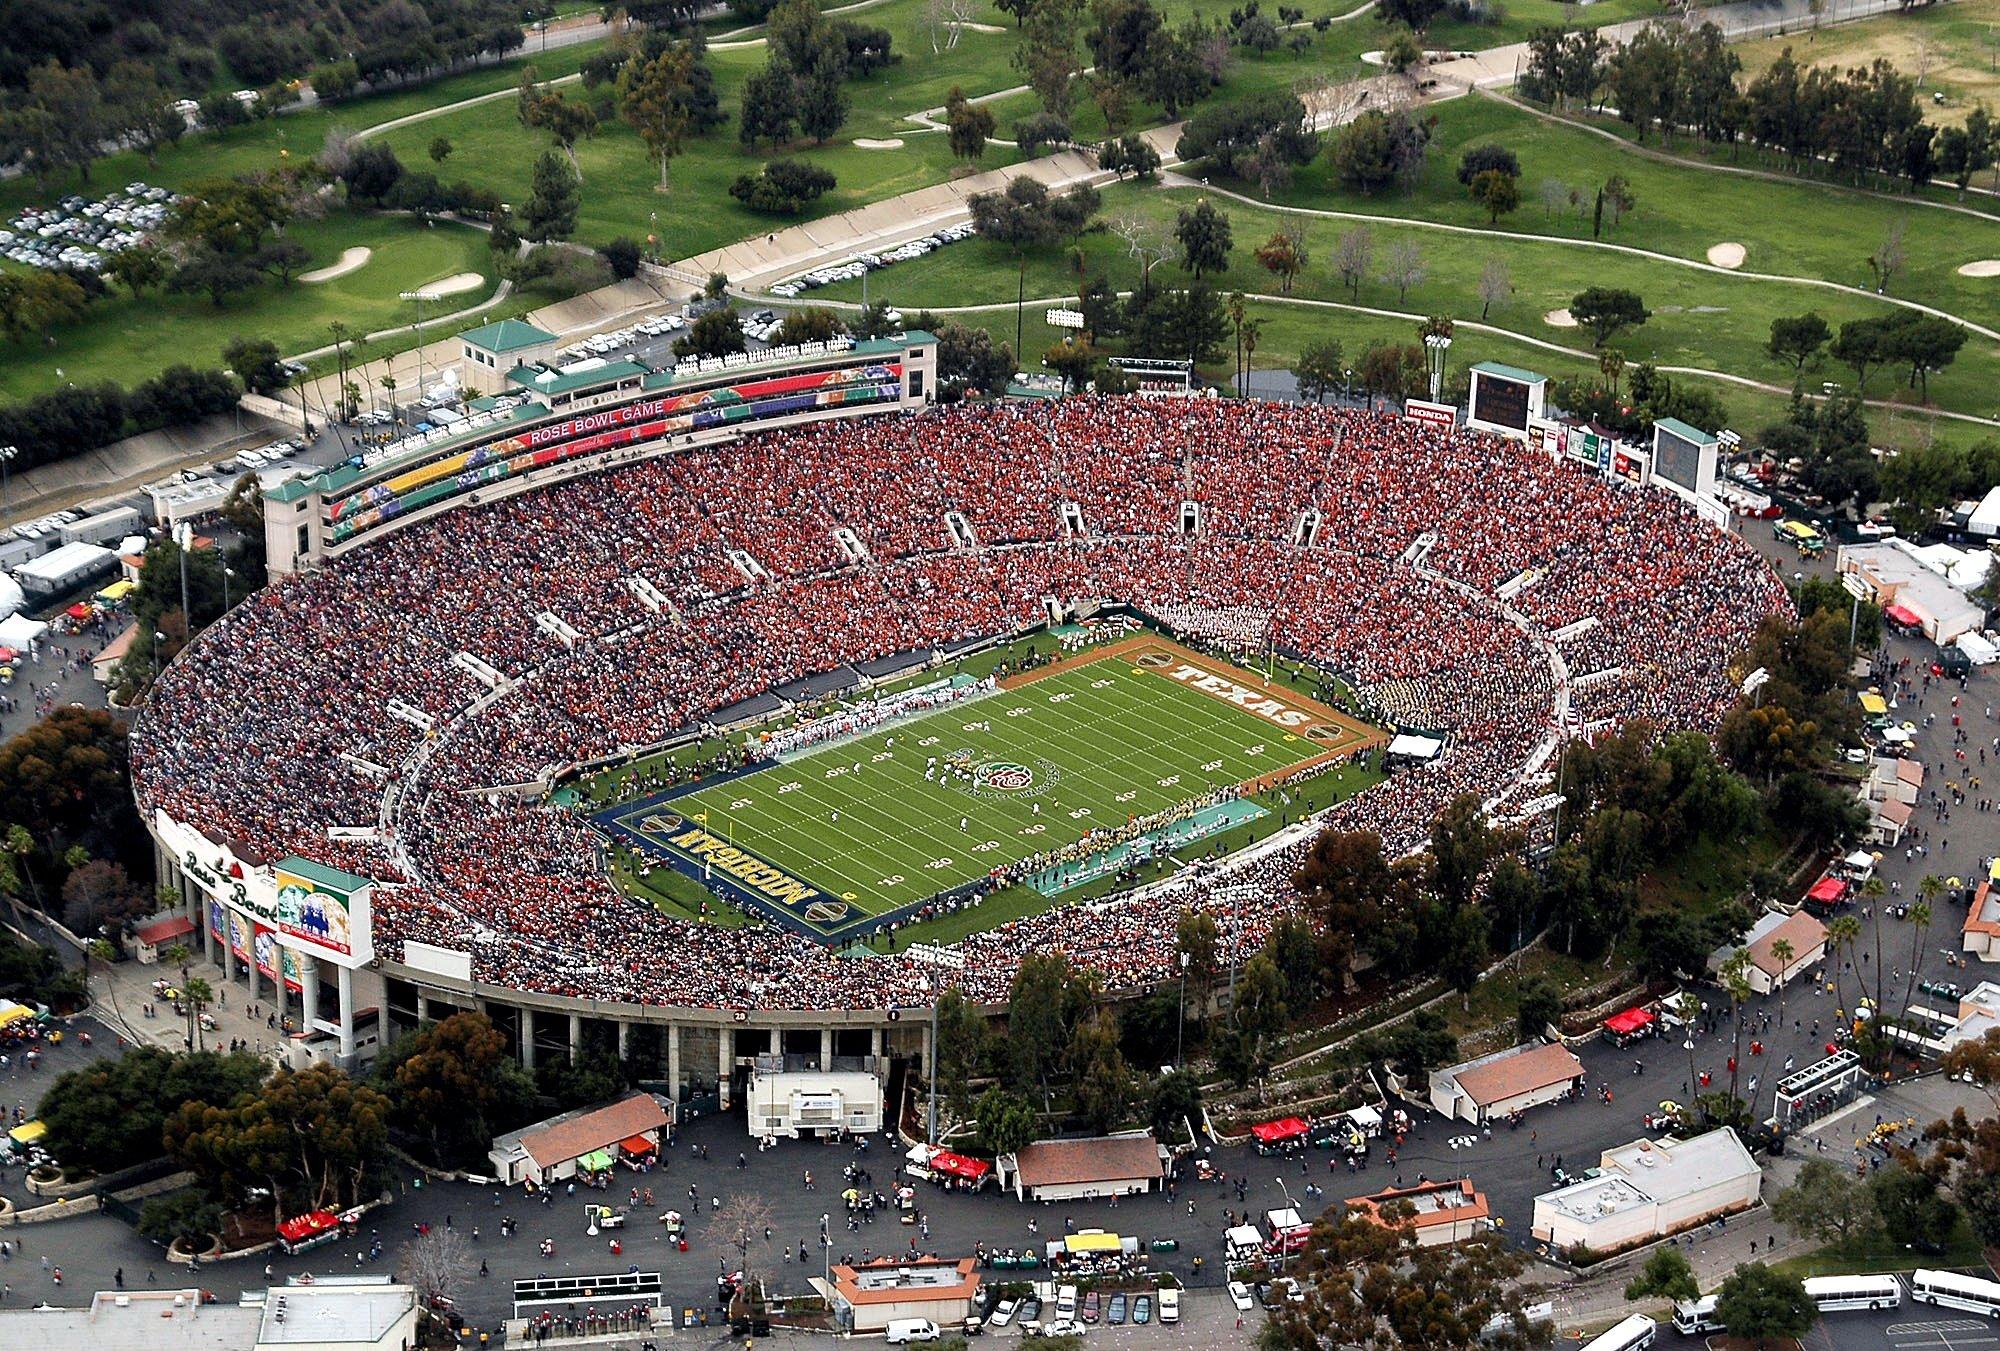 20 rose bowl (ucla) - best college football stadiums